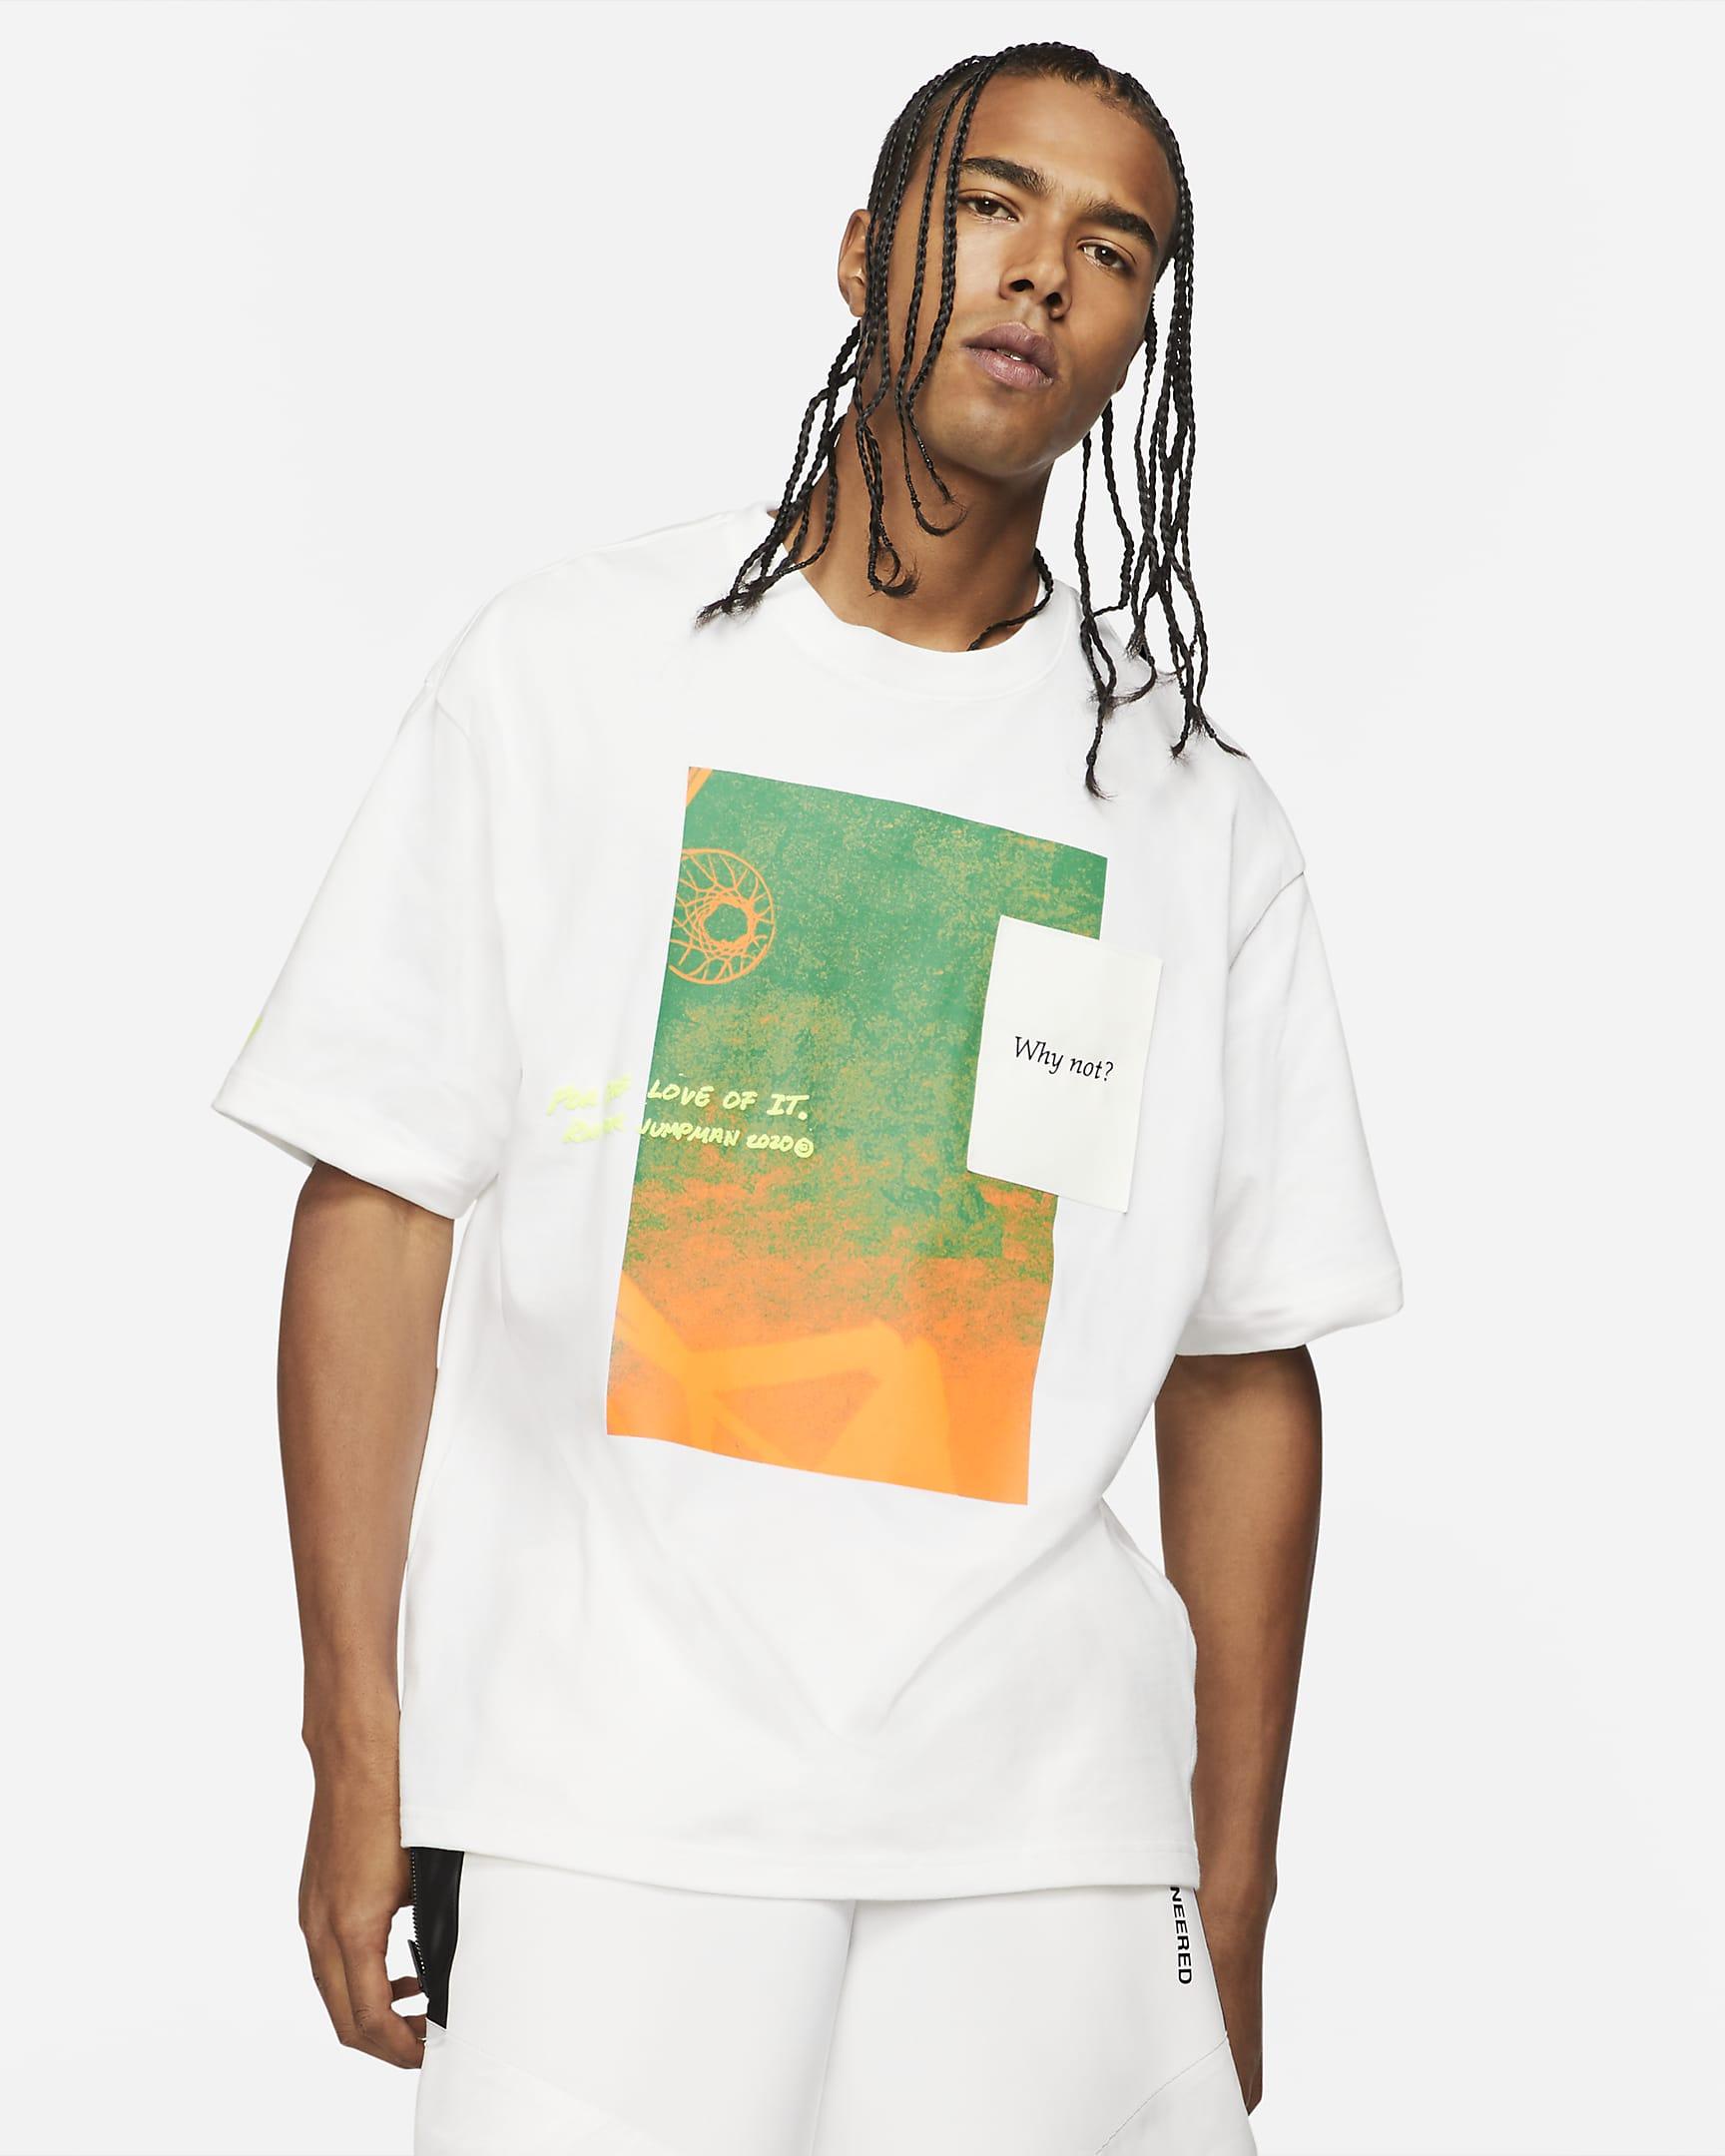 jordan-why-not-mens-short-sleeve-t-shirt-sw10WD